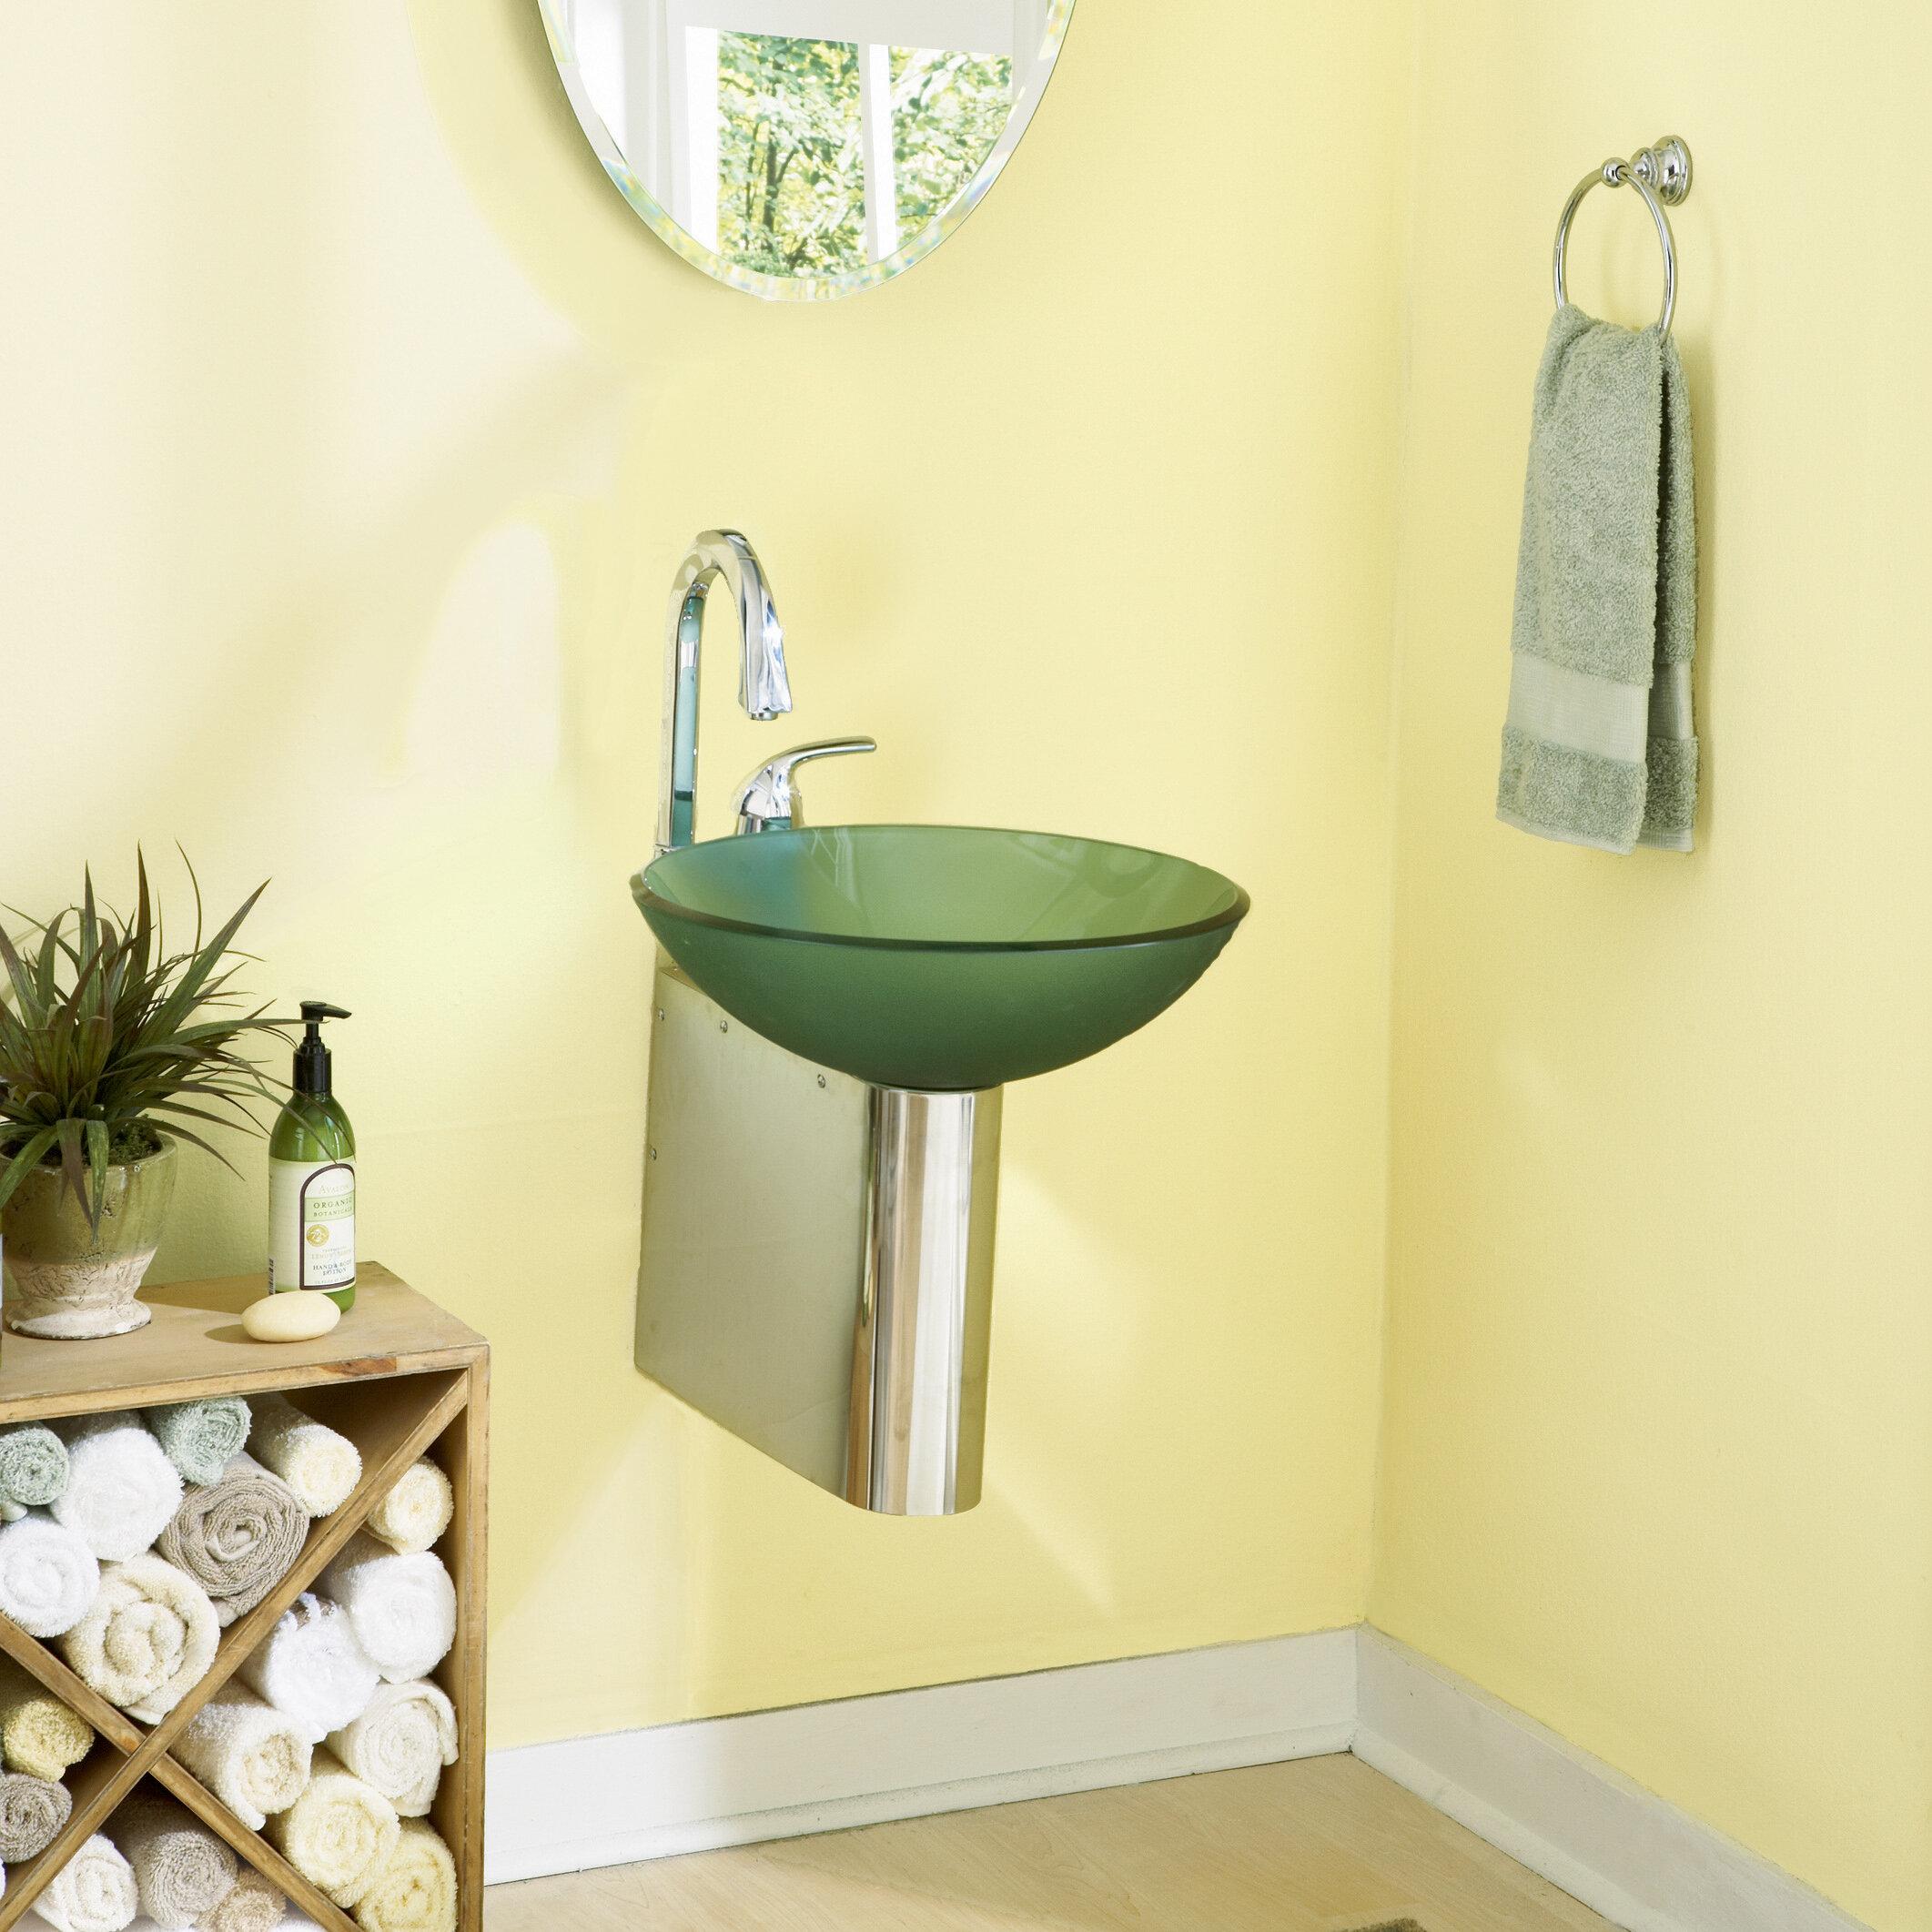 decolav wall mounted sink bracket wayfair - Wall Mount Sink